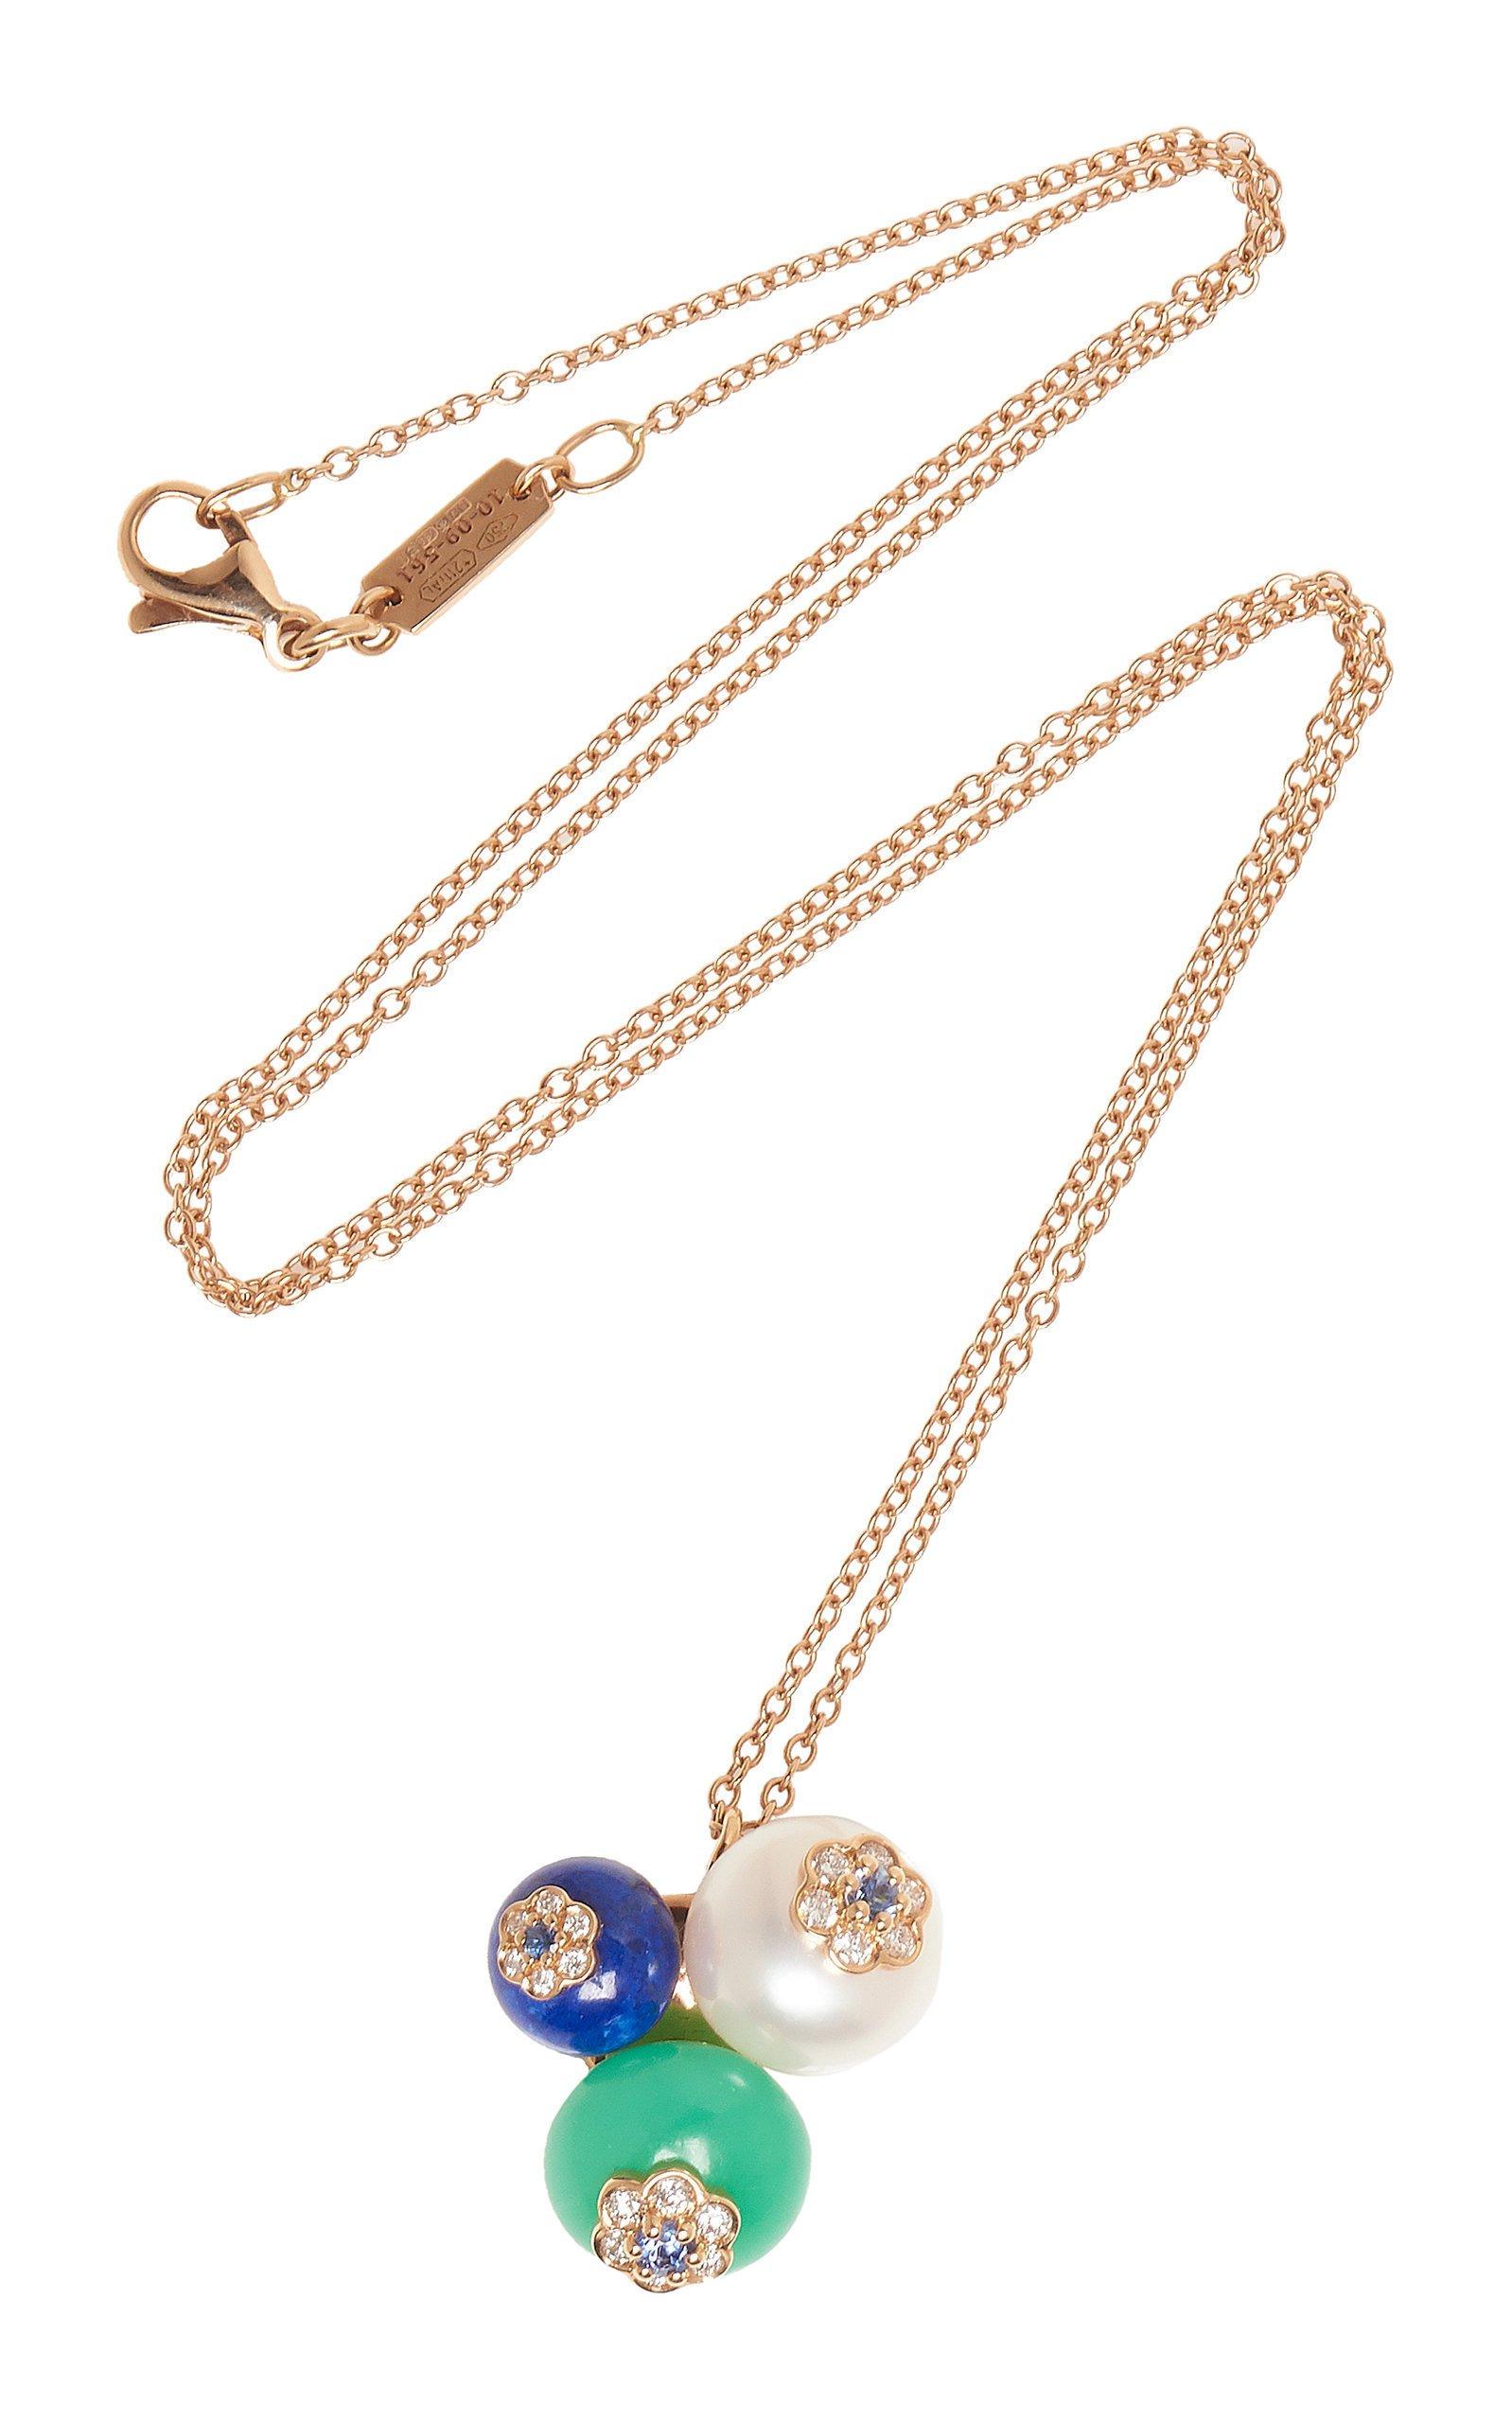 David Morris Forest Berry Necklaces